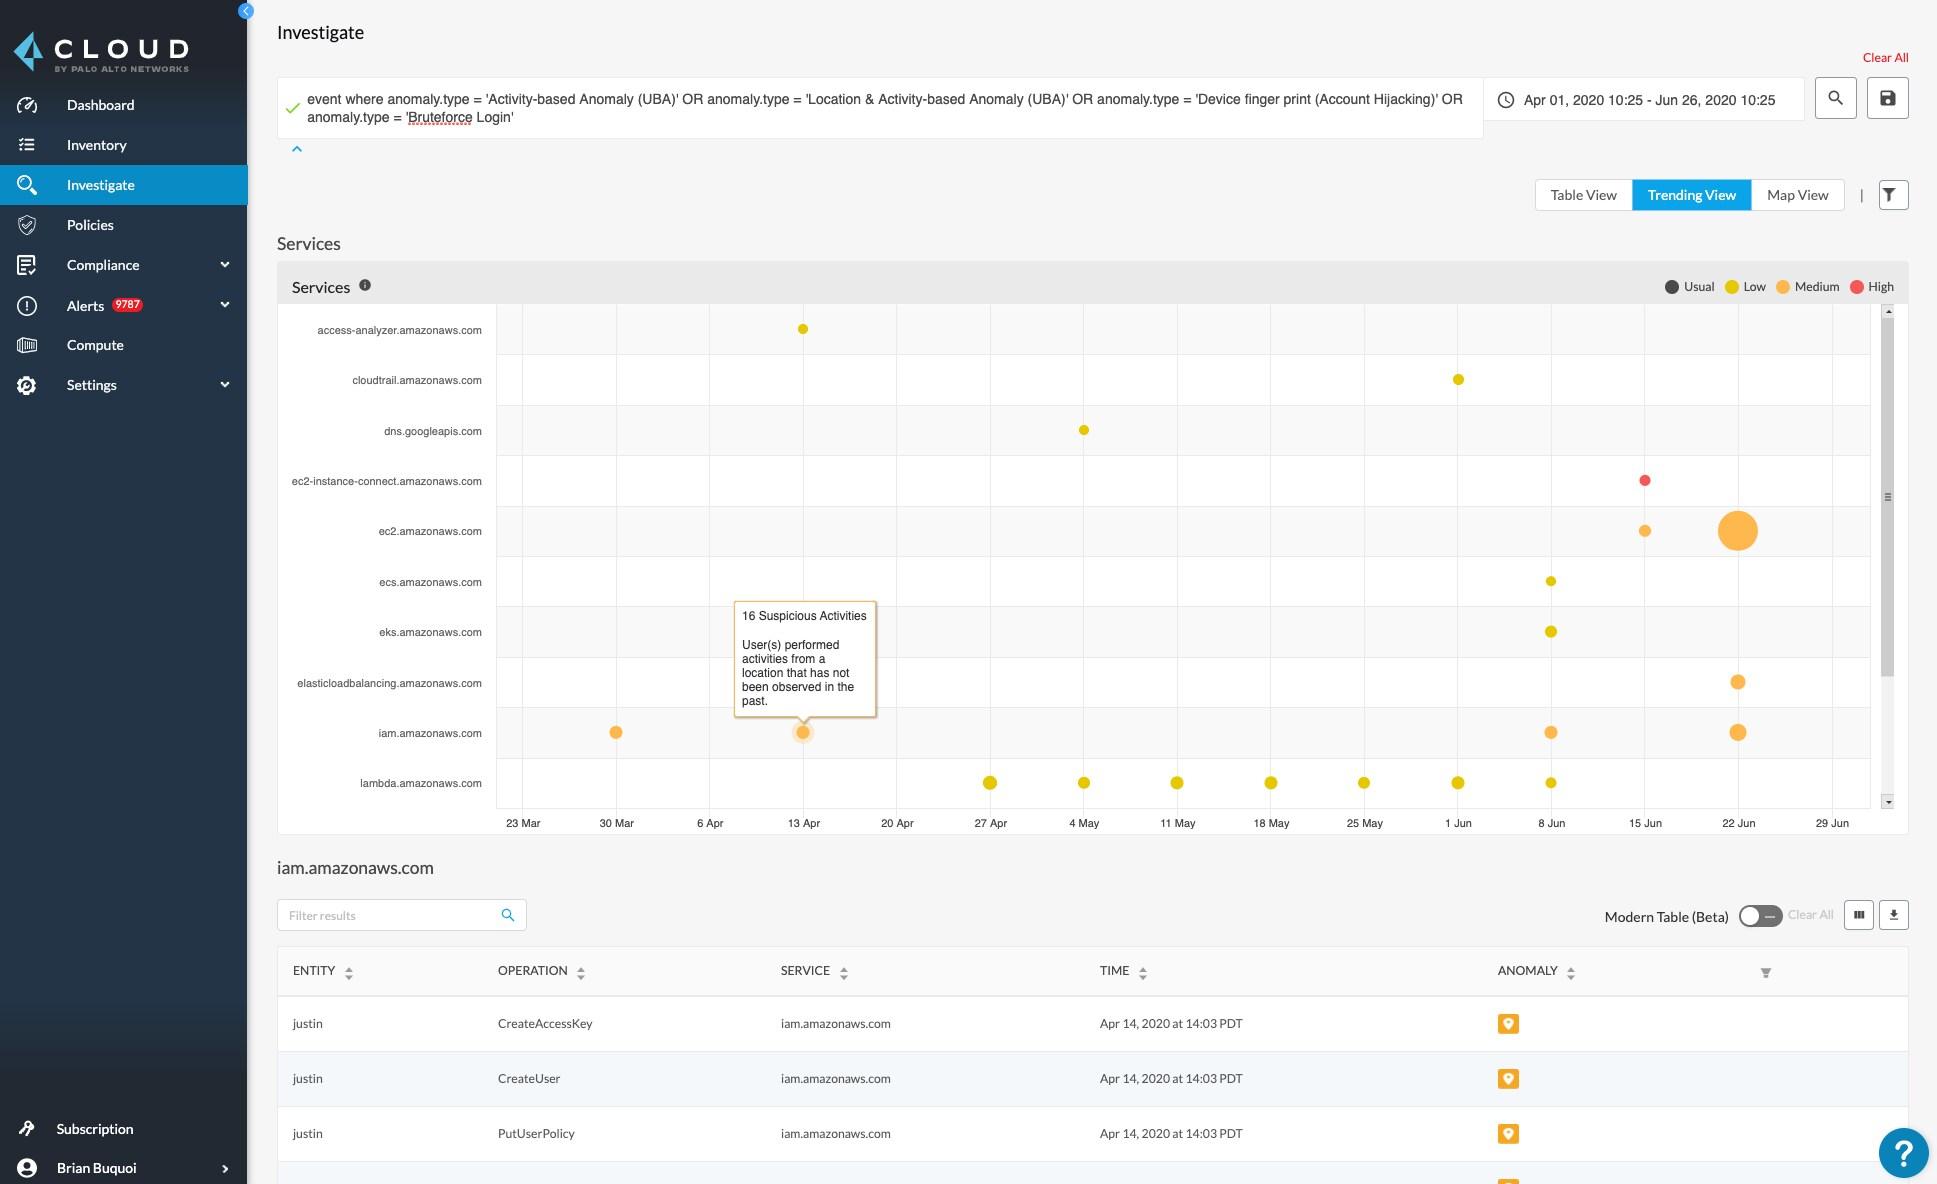 UEBA investigation trending view in Prisma Cloud